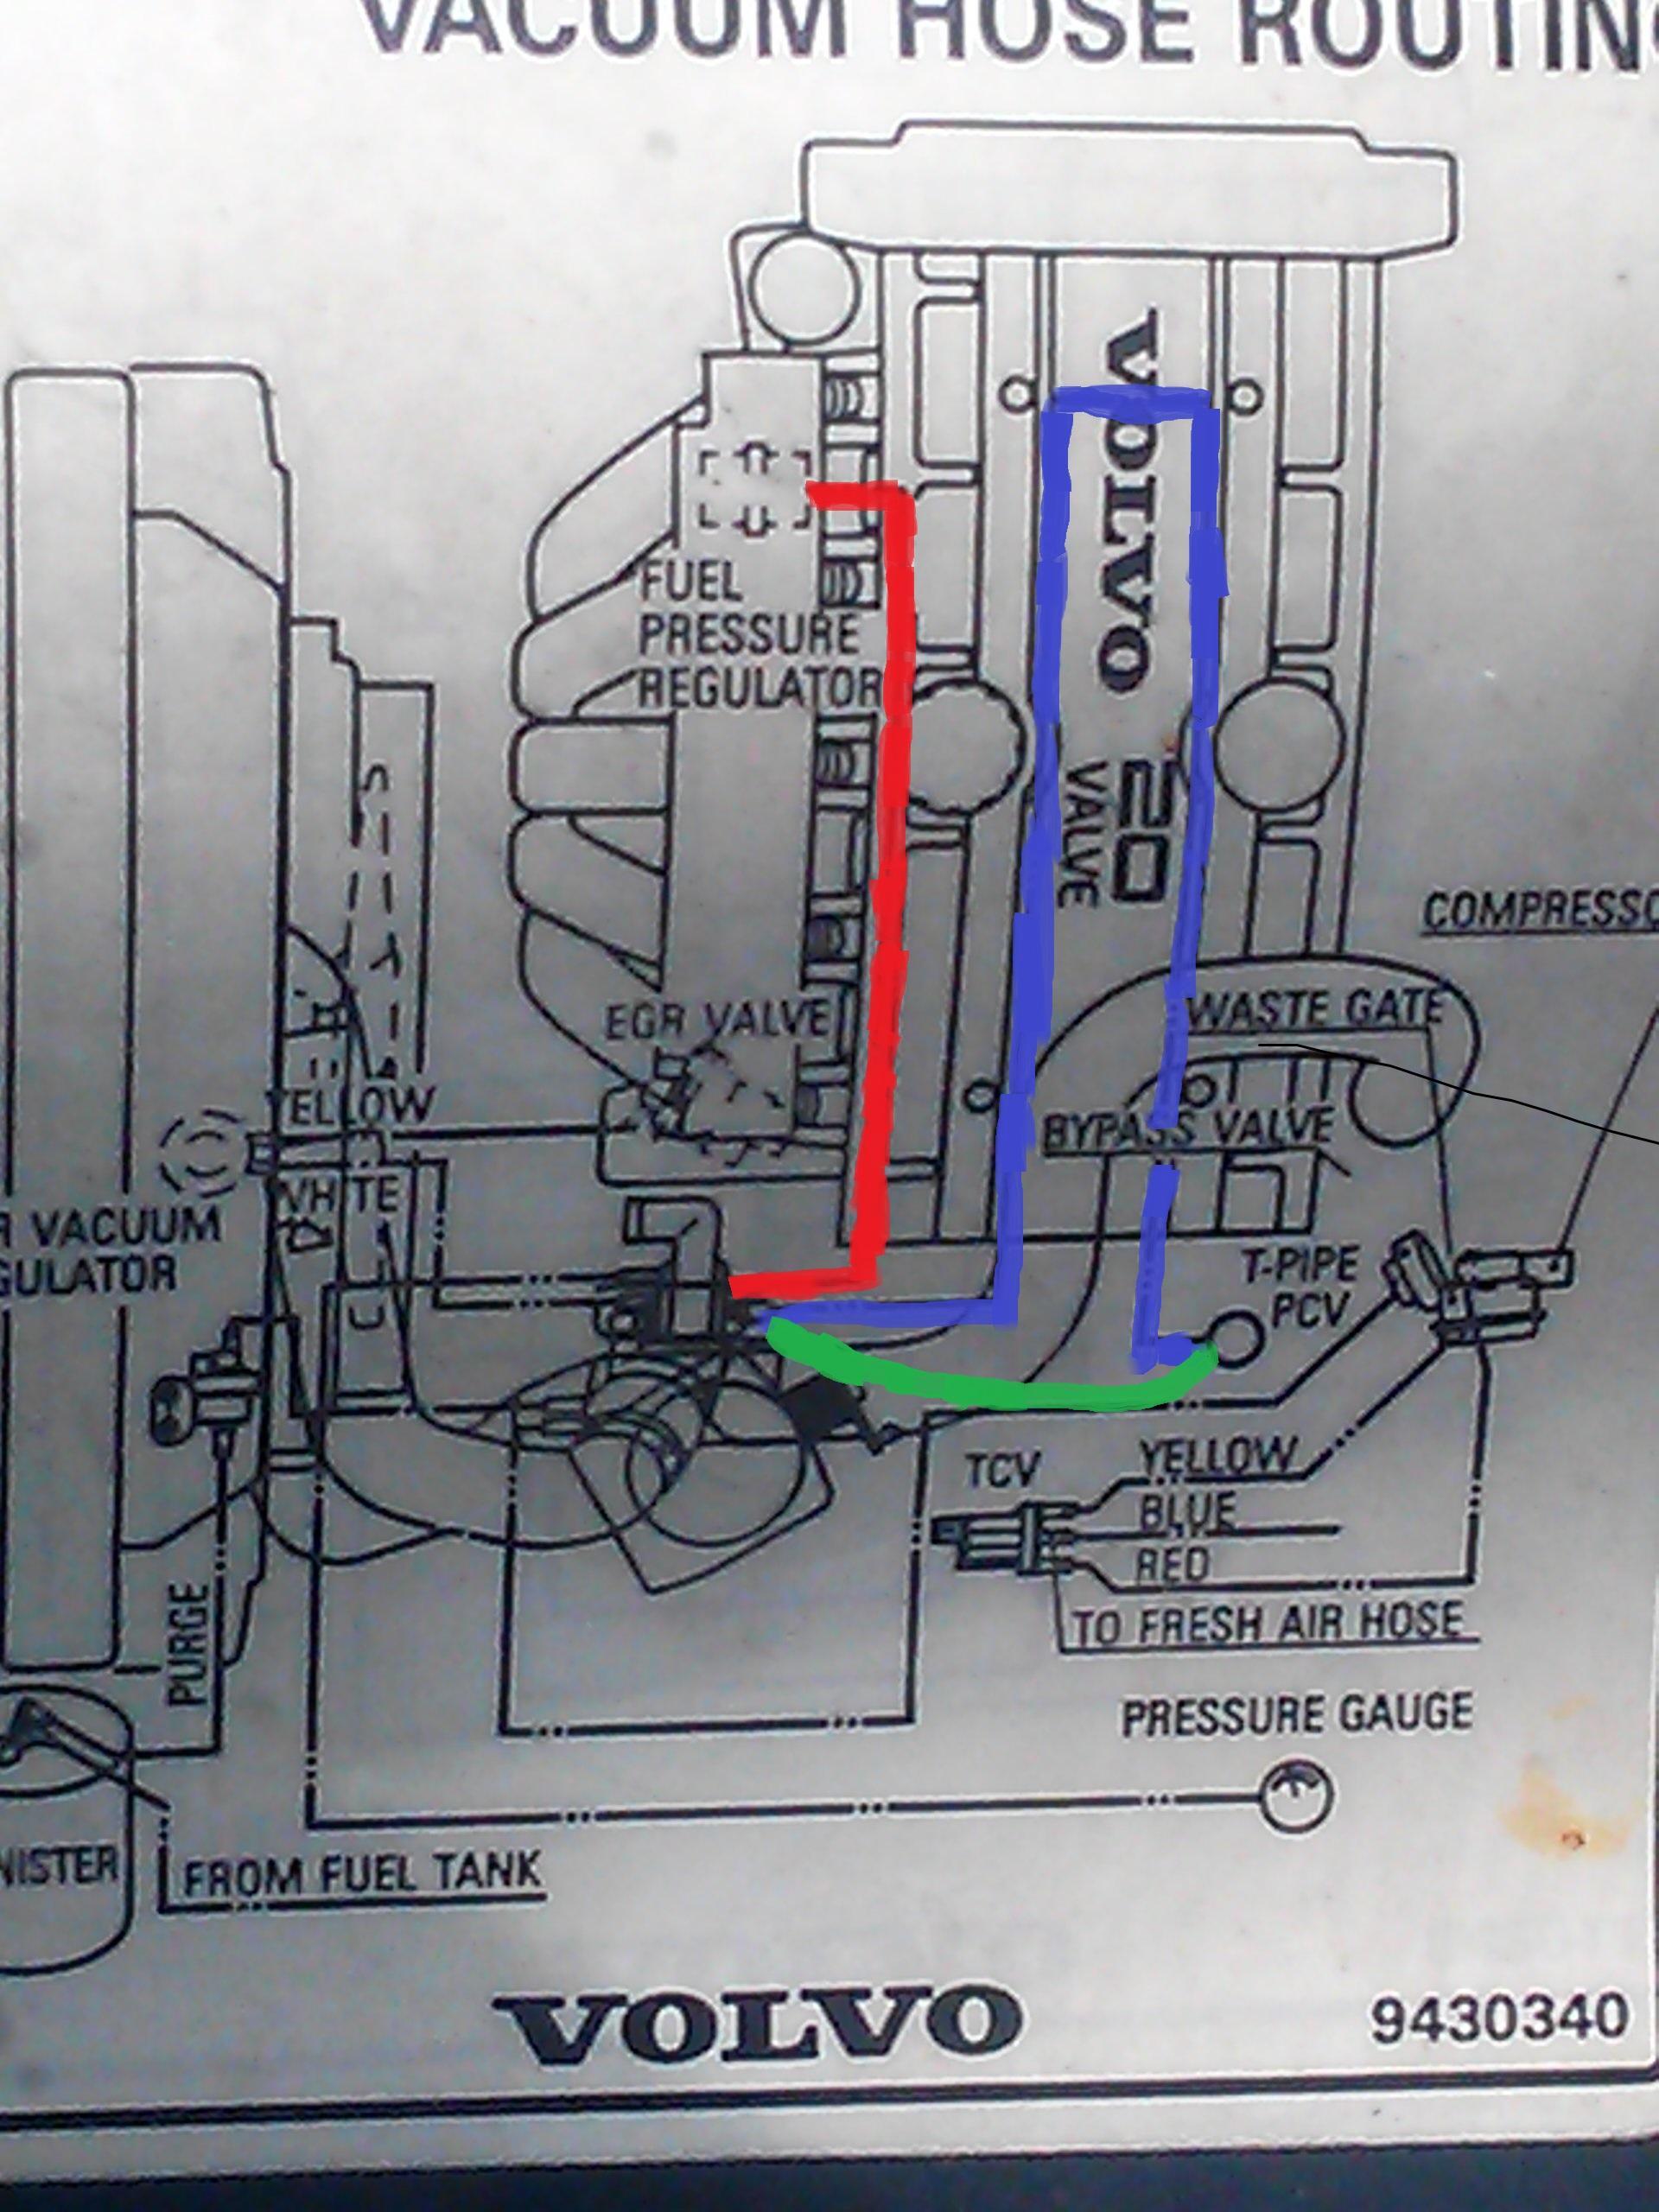 1994 850 turbo vacuum diagram problem page 2 9876545g sciox Gallery